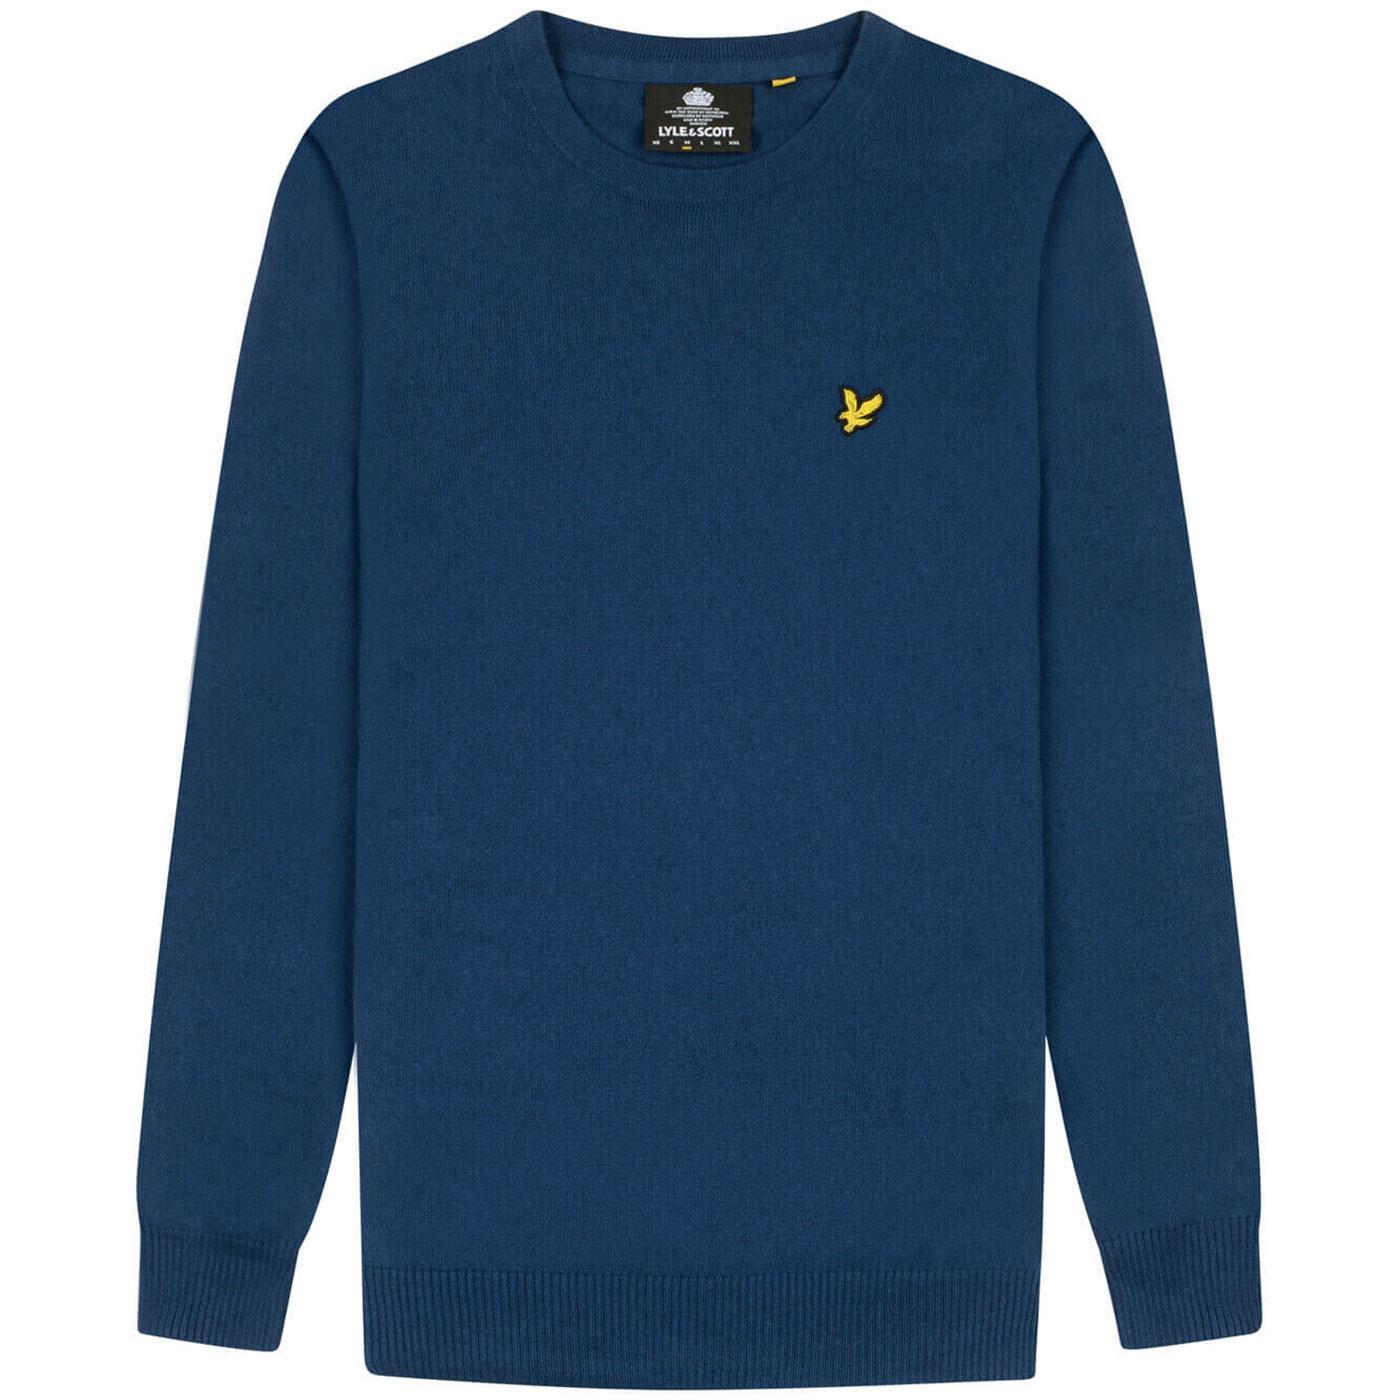 LYLE & SCOTT Cotton/Merino Crew neck Sweater I